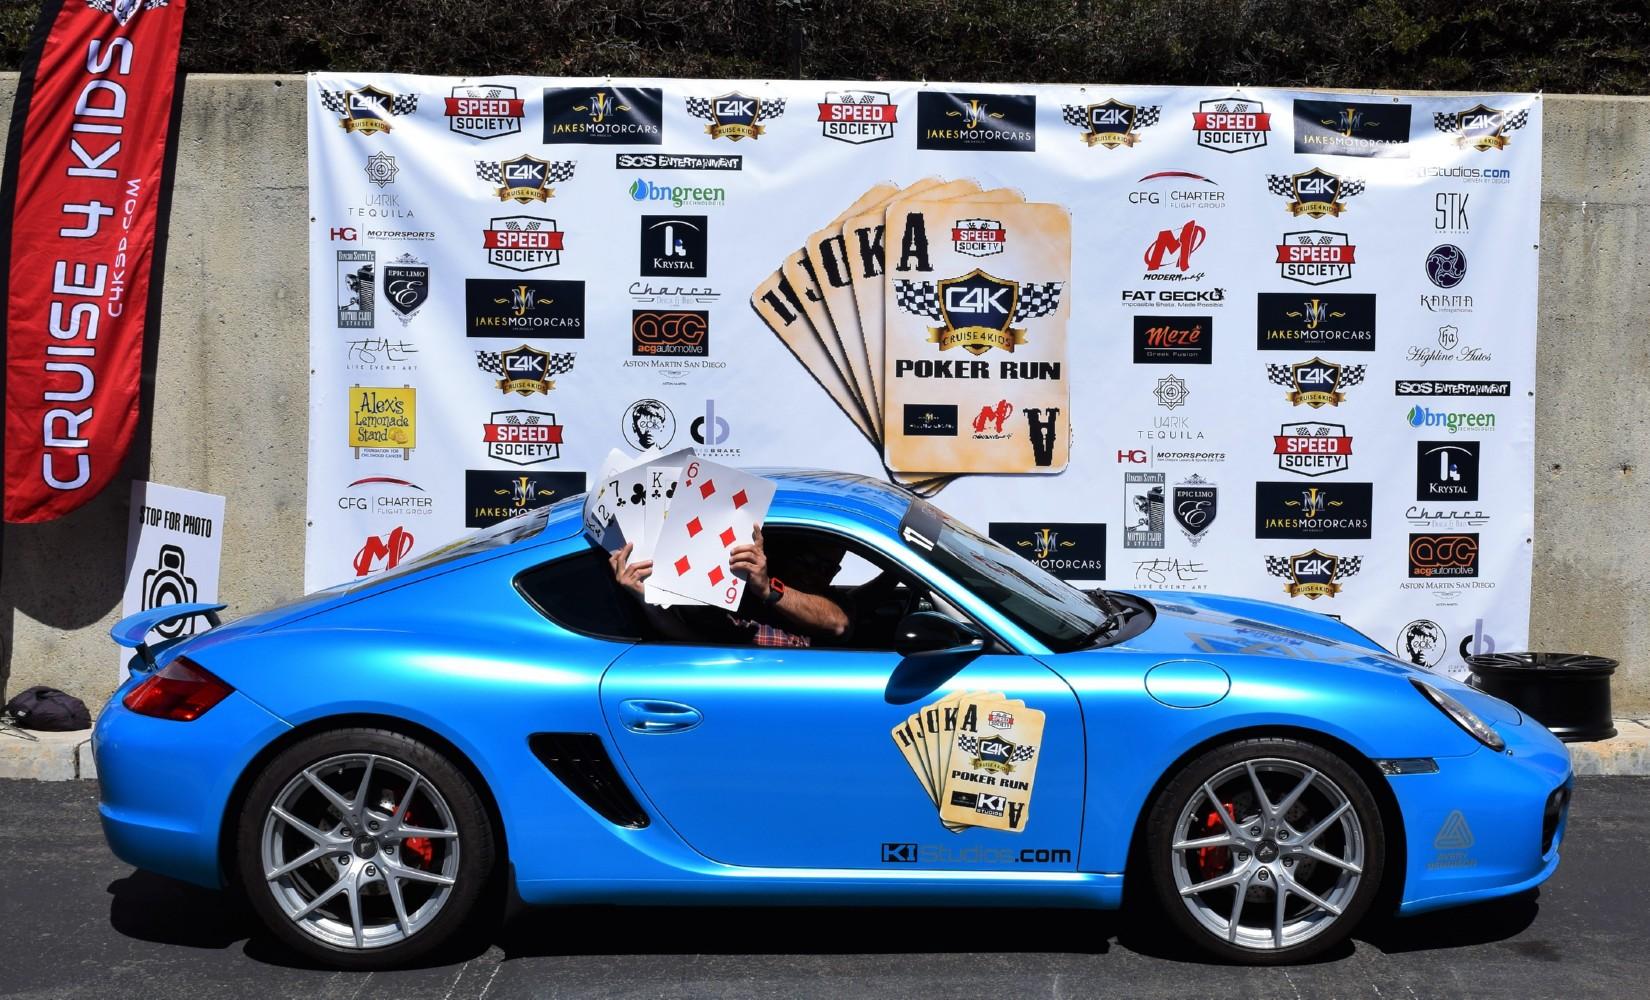 Poker Run 2017 Banner Photos - 46.jpg